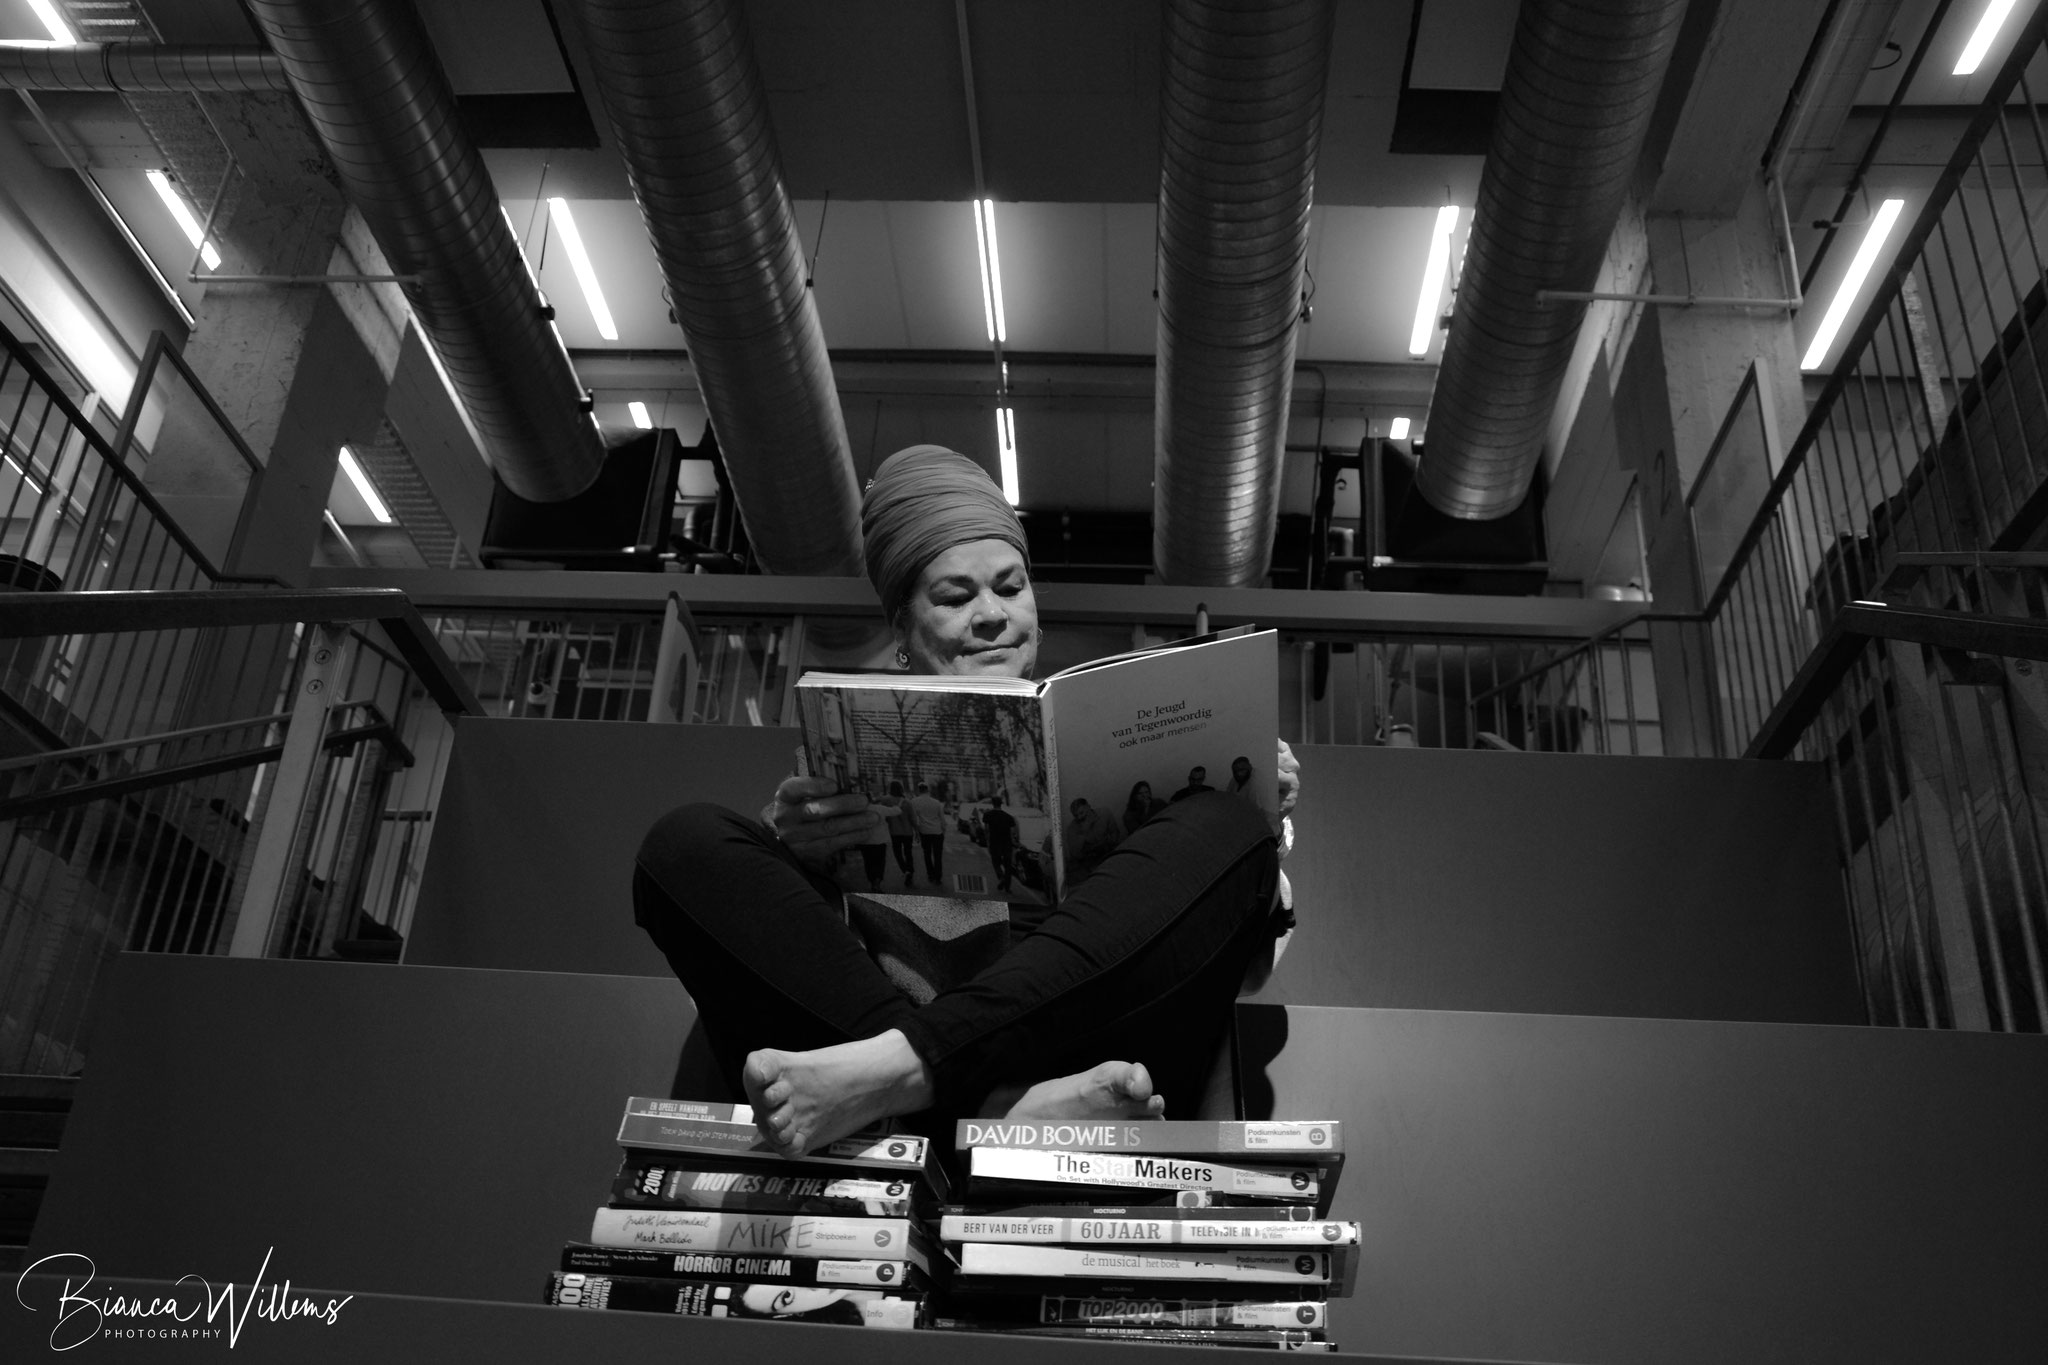 Bibliotheek_Shoot_Pop_Up_Yoga02